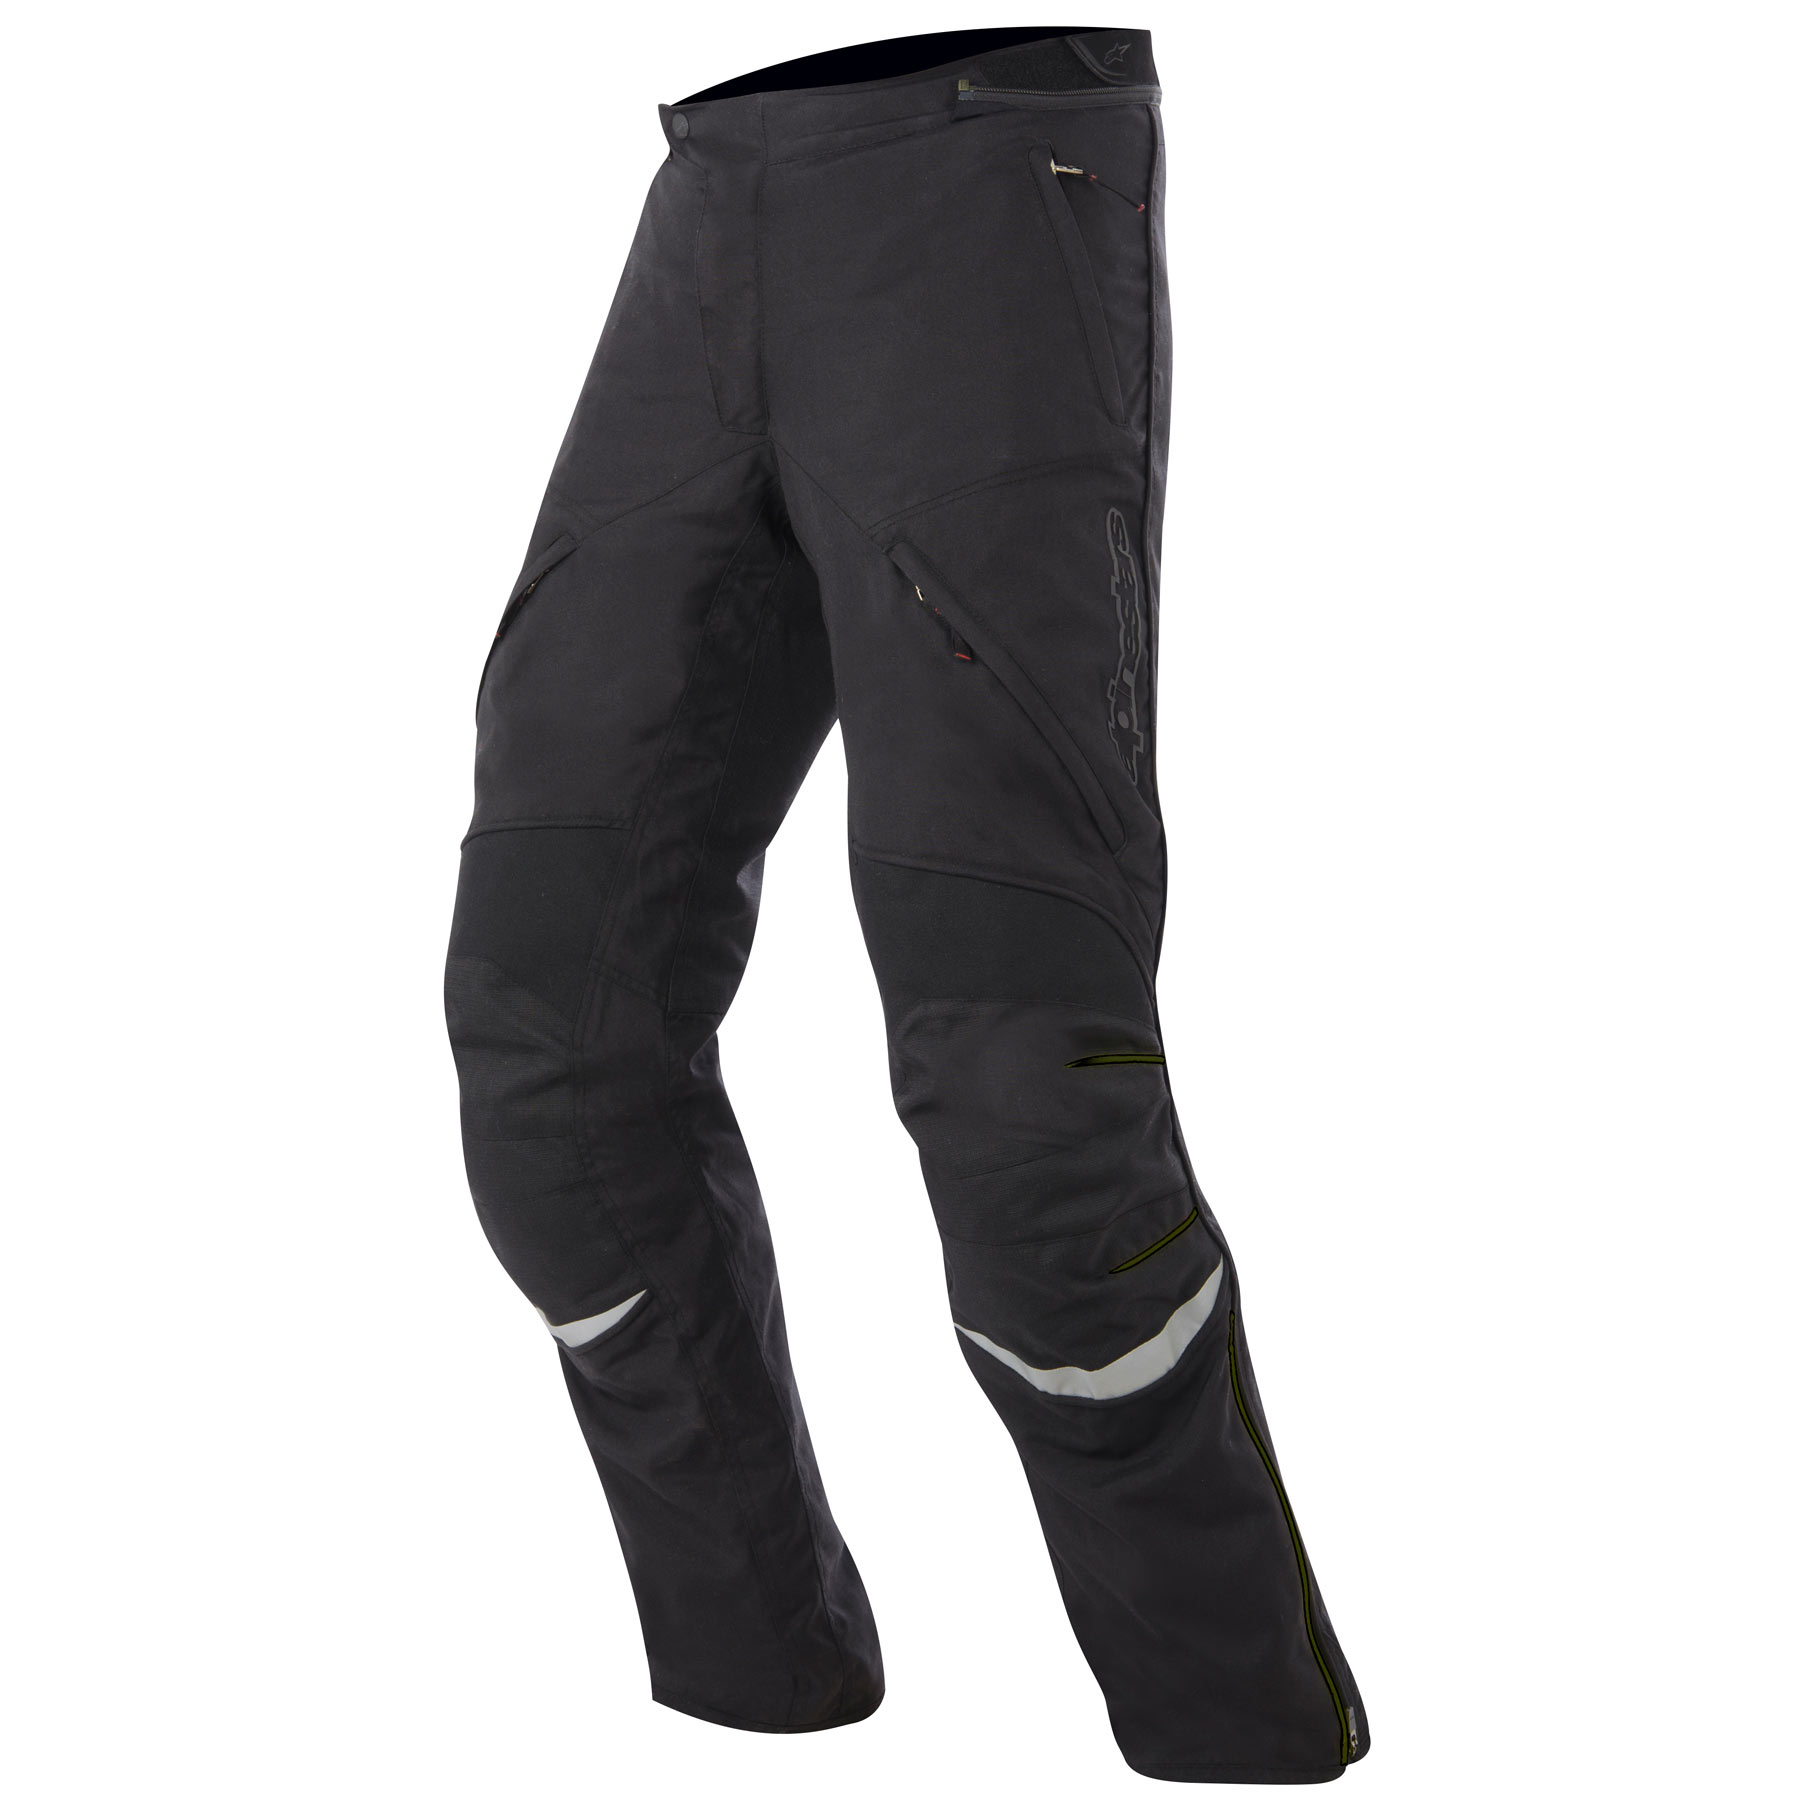 Alpinestars New Land 2014 Mens Gore Tex Pants Black by